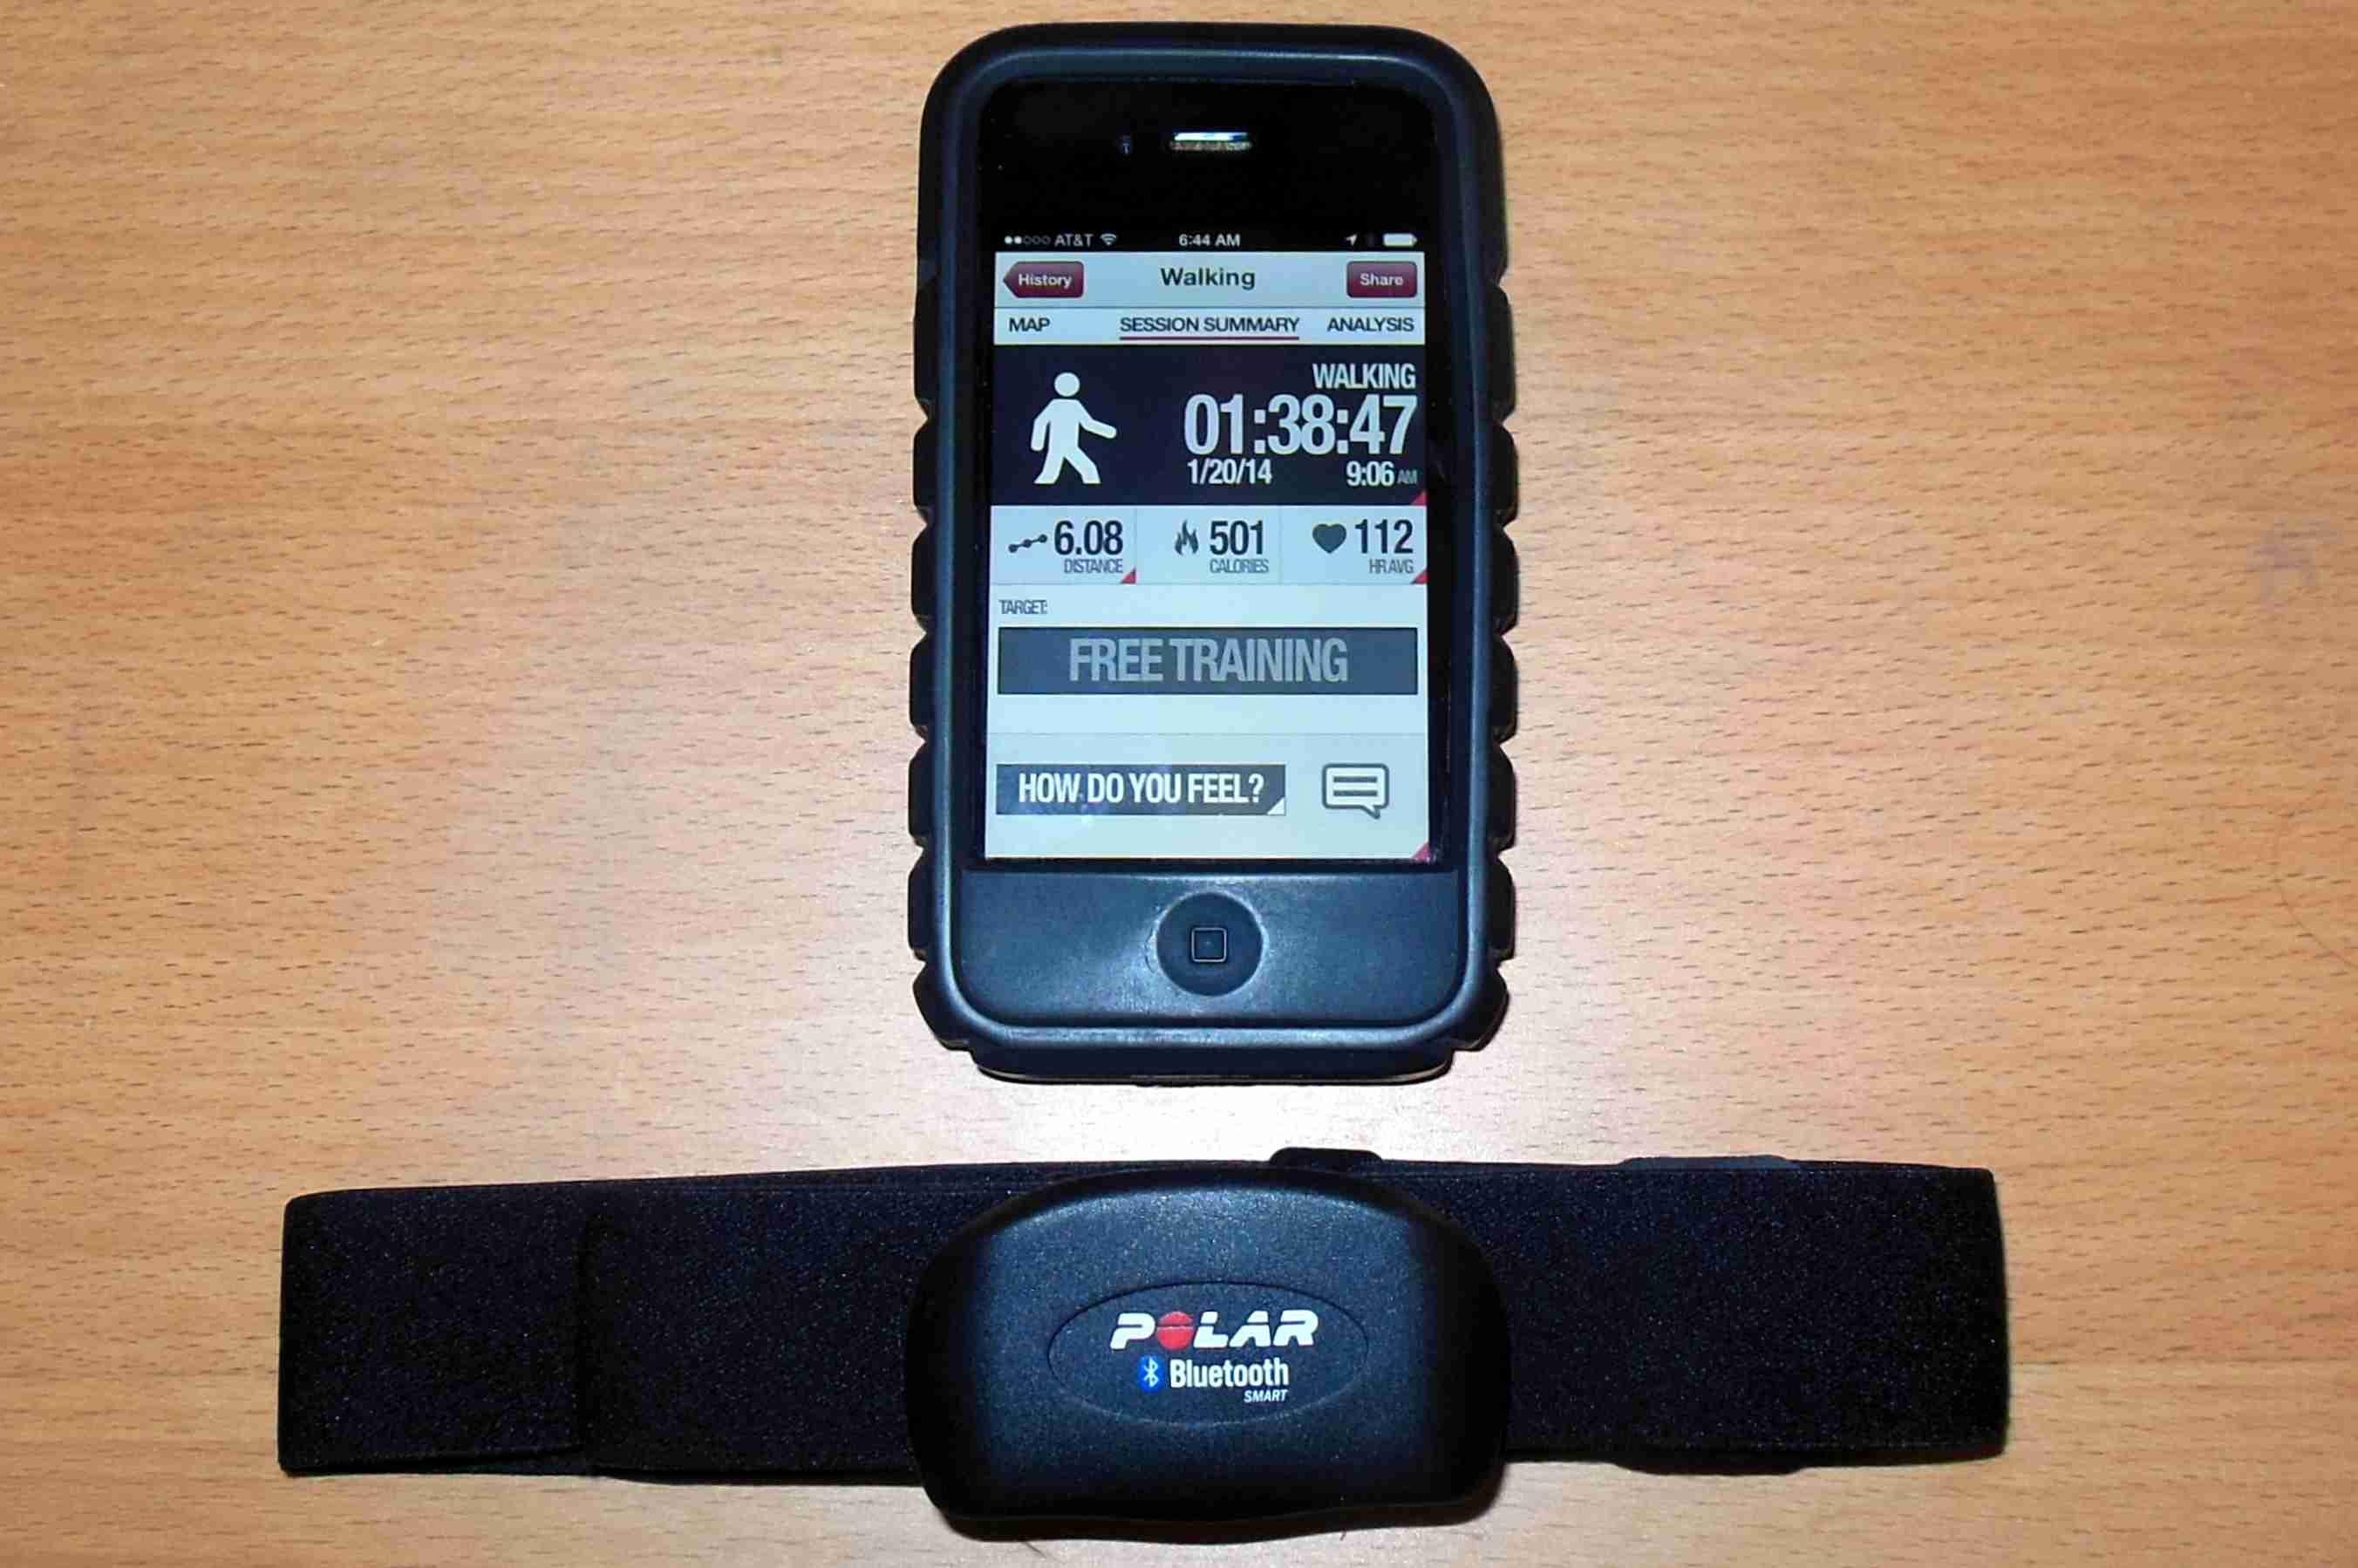 Polar H7 Bluetooth Chest Strap and Polar App